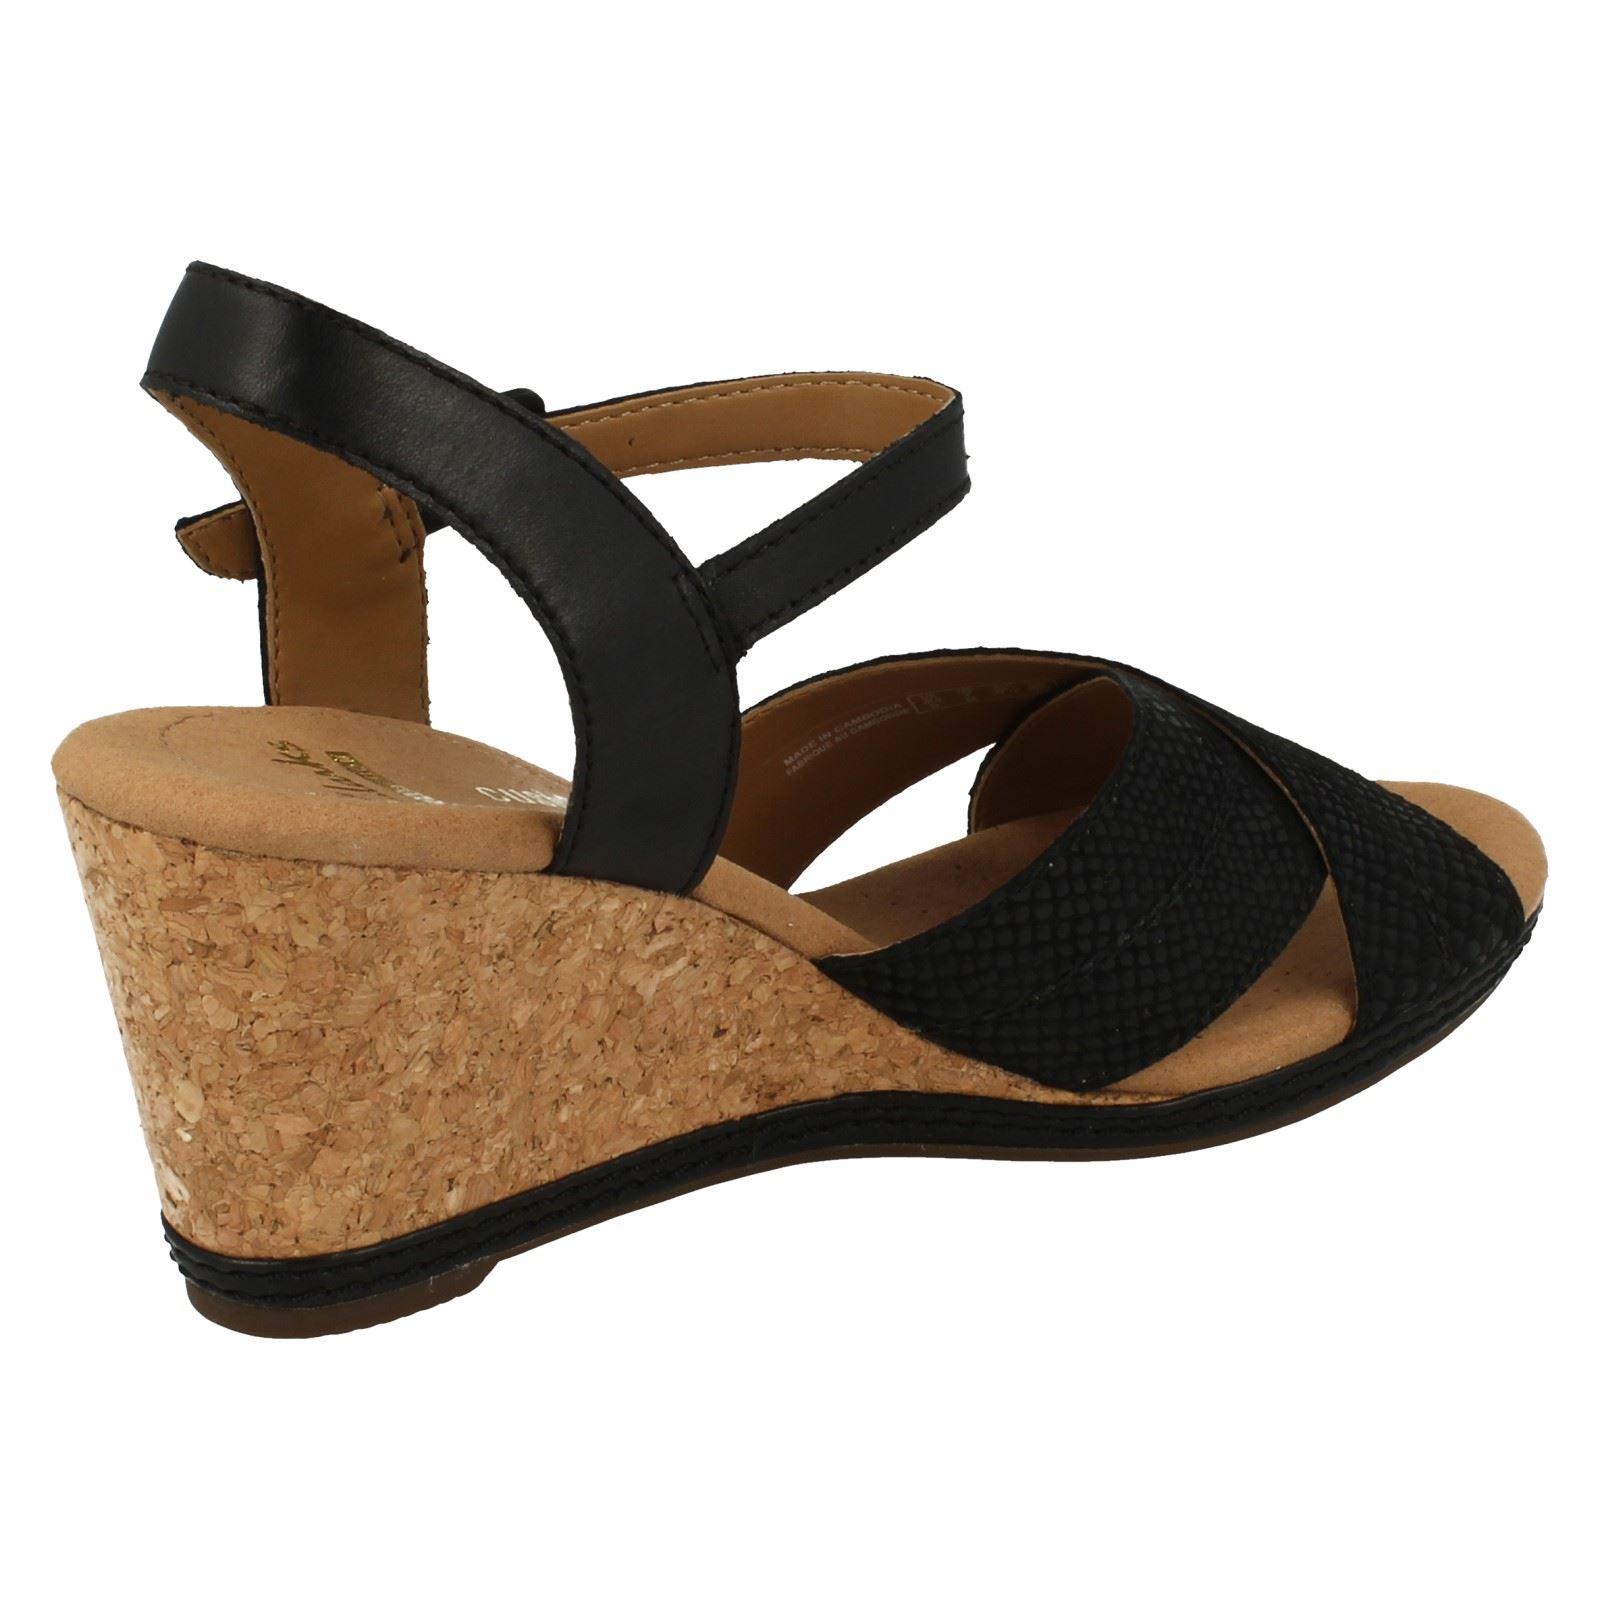 7a4ed00ac93b Clarks-Ladies-Open-Toe-Wedge-Sandals-Helio-Latitude thumbnail